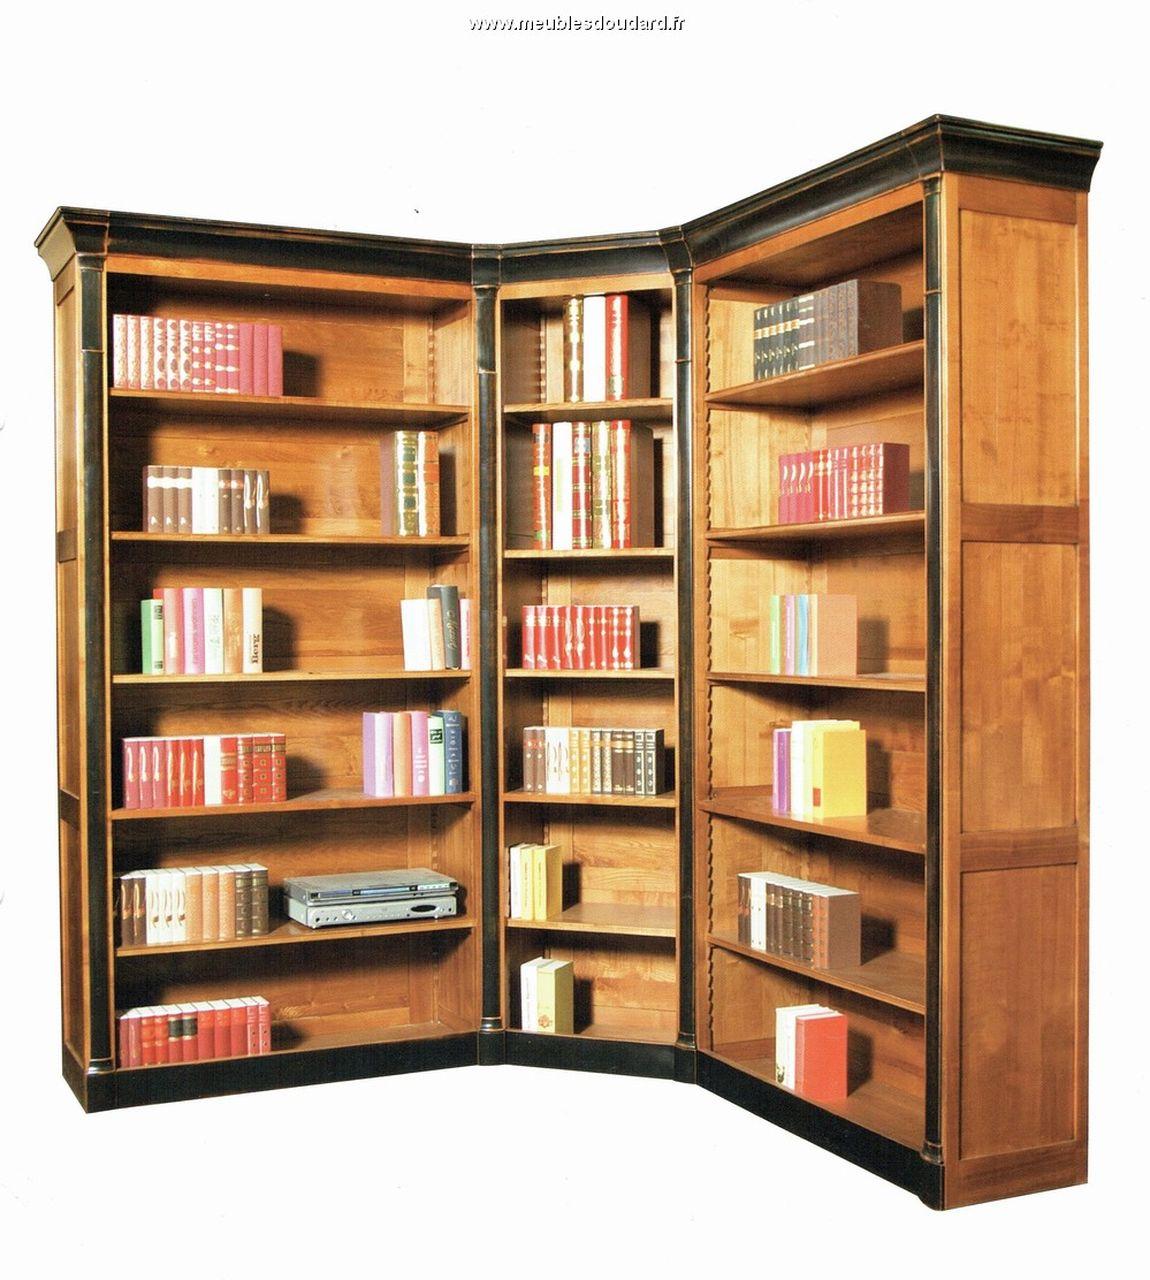 biblioth que moderne en bois massif biblioth que en ch ne naturel sur mesure am nagement. Black Bedroom Furniture Sets. Home Design Ideas